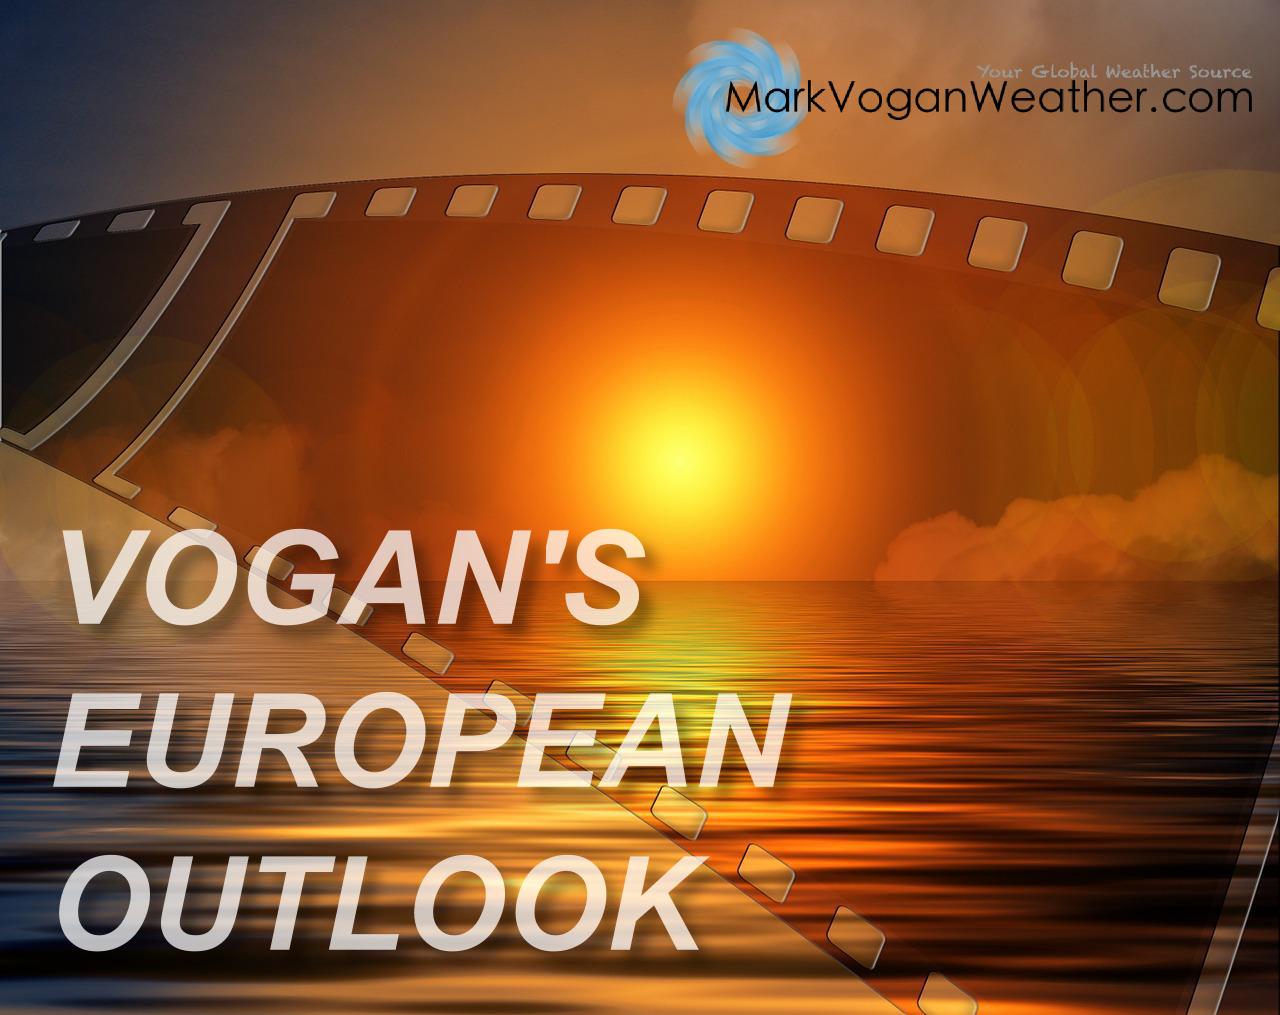 SUN 30 MAR: VOGAN'S EUROPEAN OUTLOOK